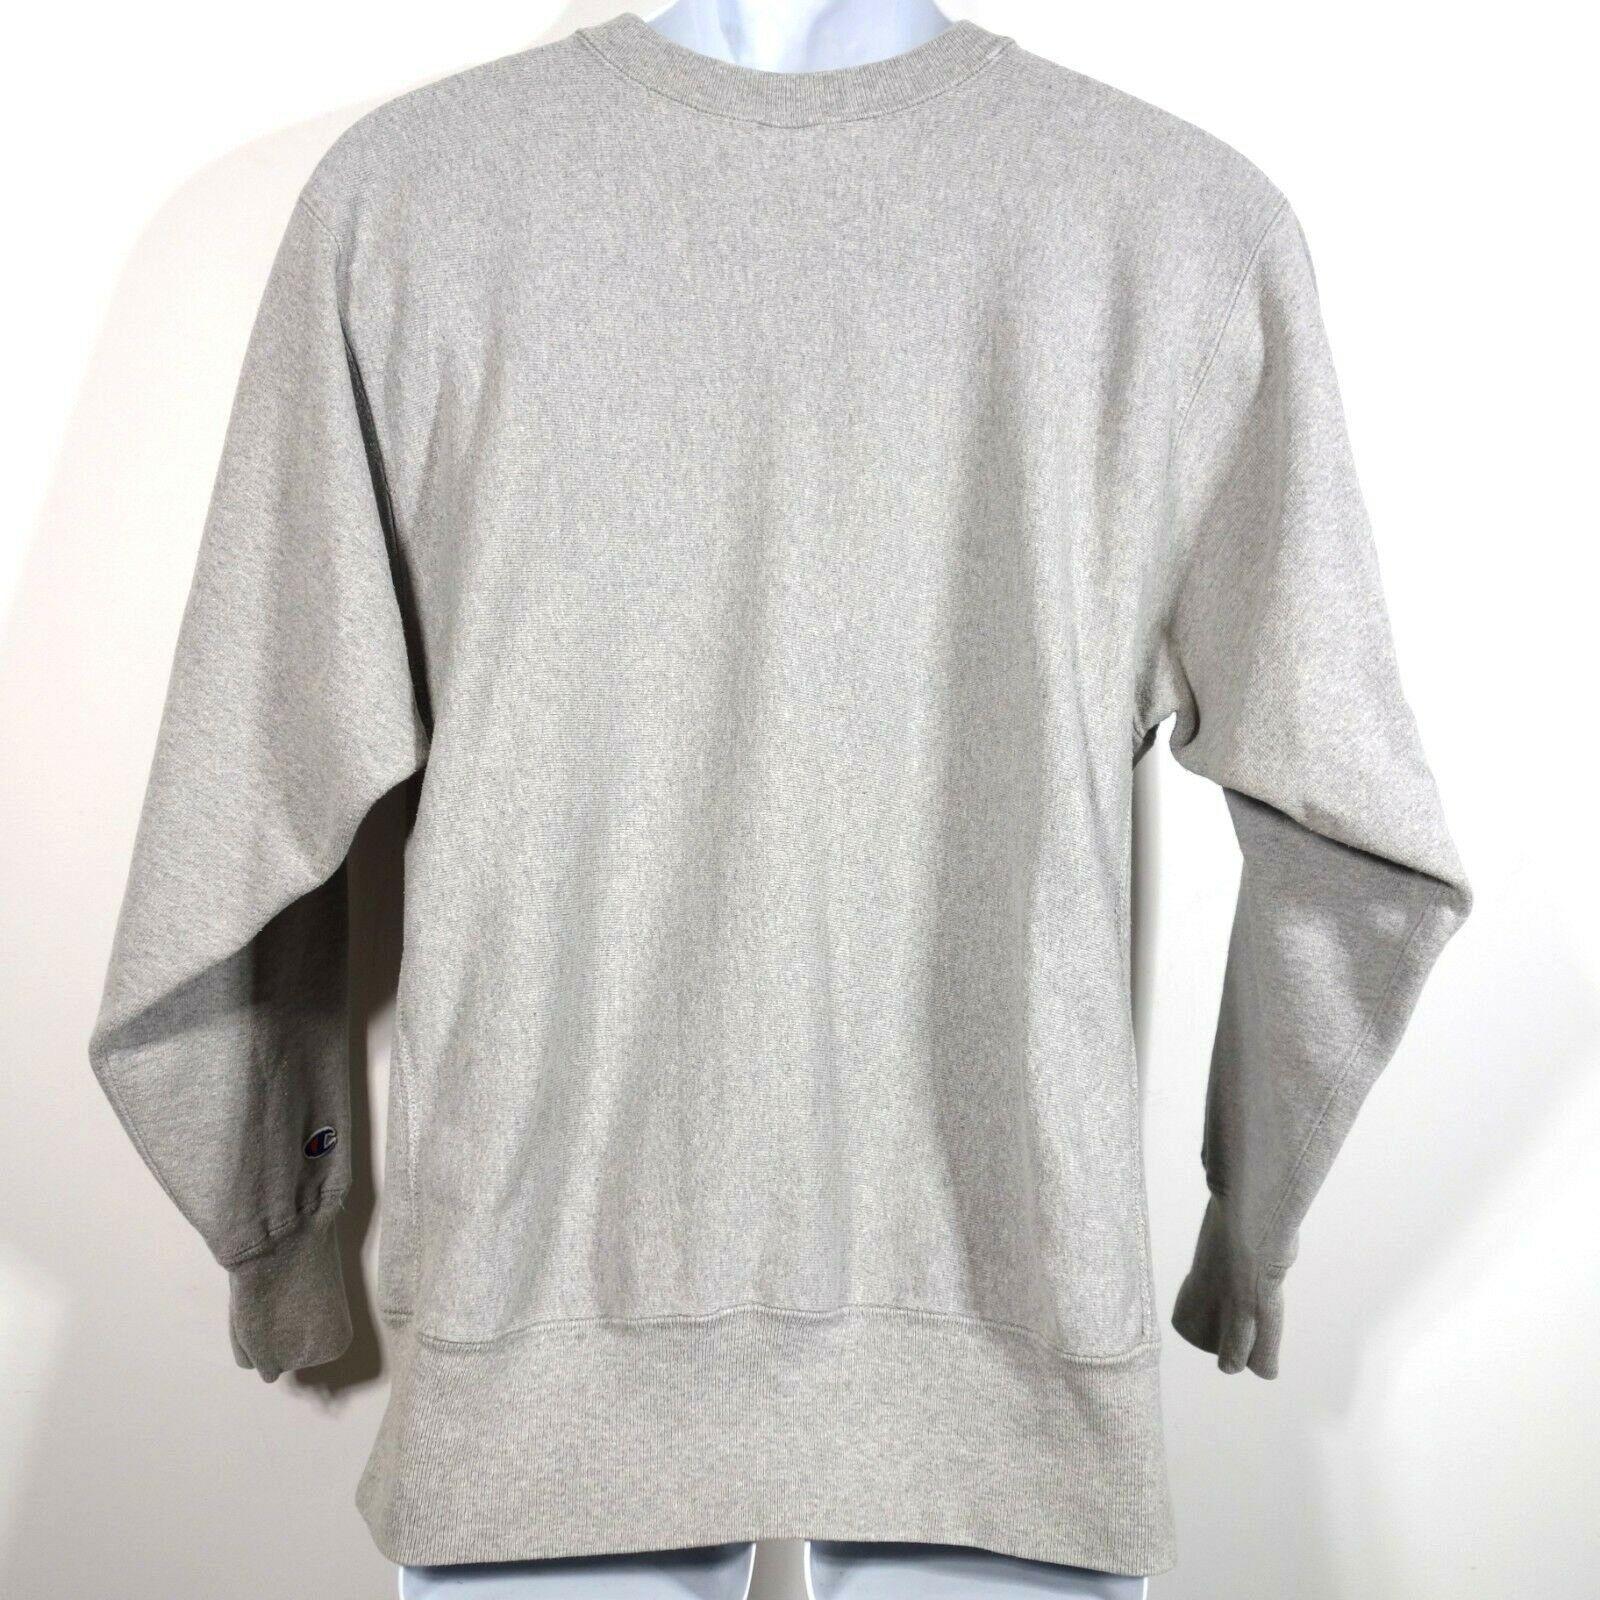 42ab2cb7 Vtg Champion Reverse Weave Pullover Crew Neck Sweatshirt Men's Large Gray  USA